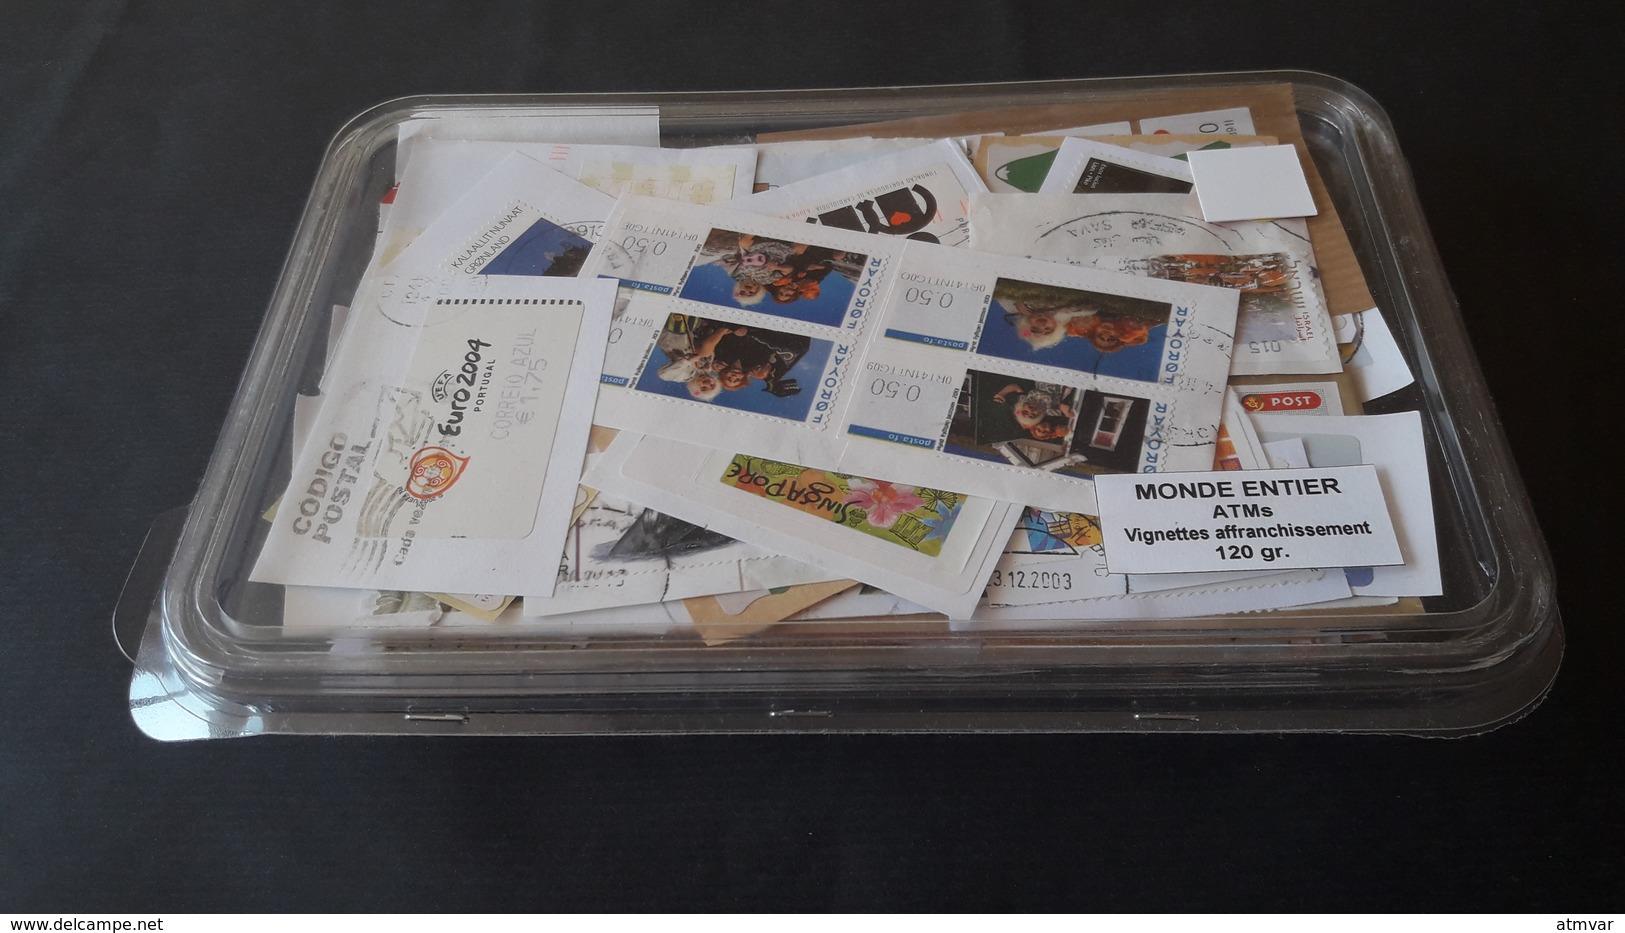 WORLDWIDE - KILOWARE 120 G. ATM - Sellos Usados, Con Papel / Used Stamps, On Paper / Timbres Oblitérés, Sur Papier - Mezclas (max 999 Sellos)